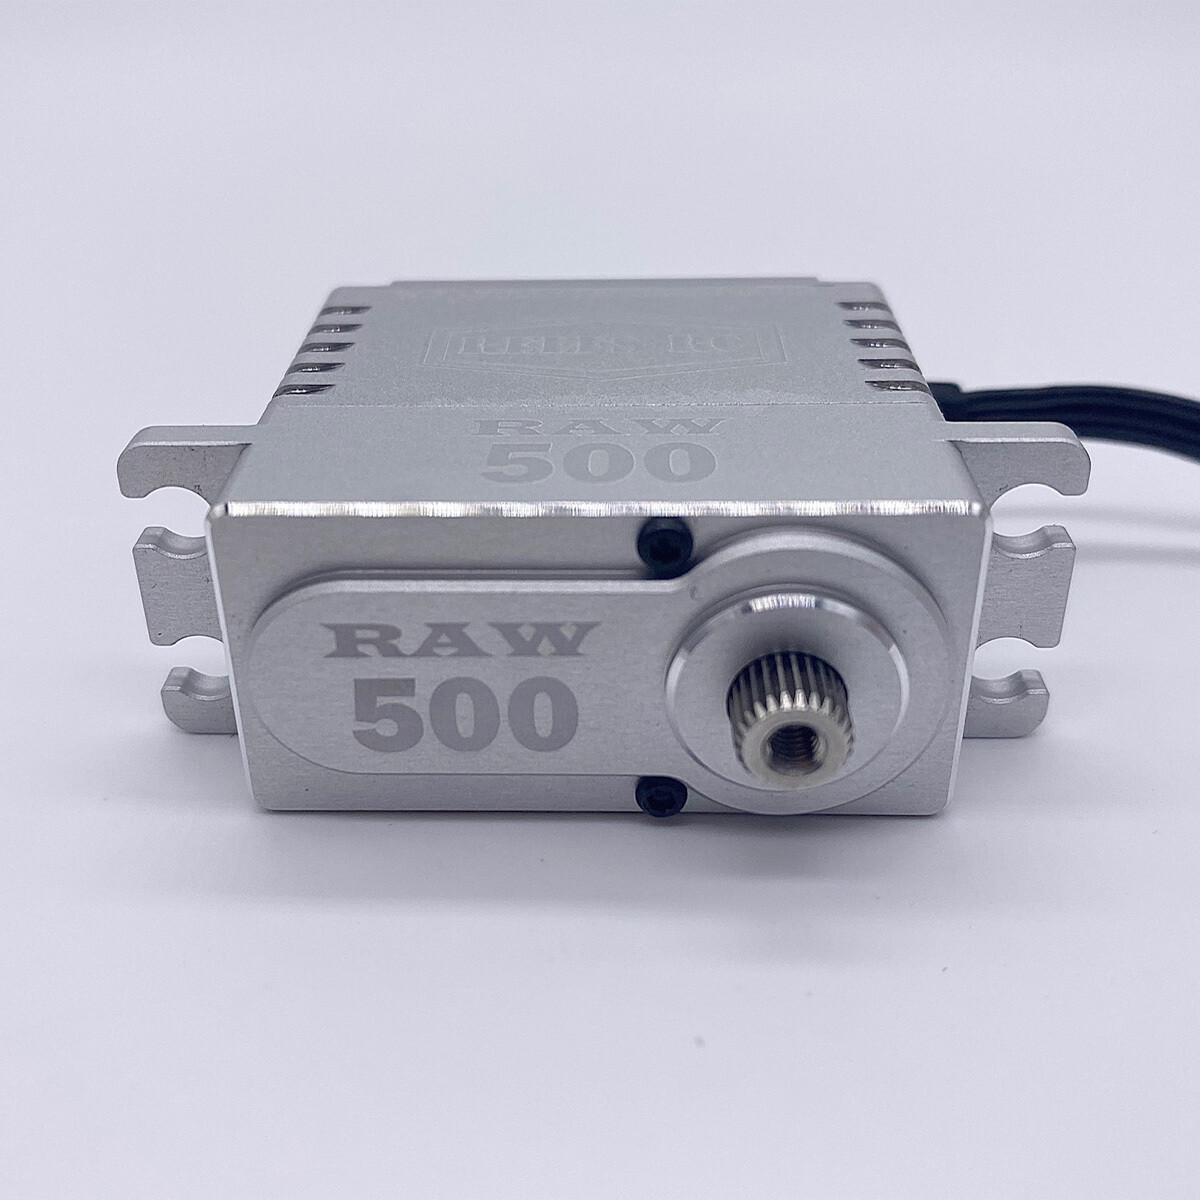 Reefs Raw 500 High Torque High Speed HV Waterproof Brushless Servo .095/500 @7.4V SEHREEFS54